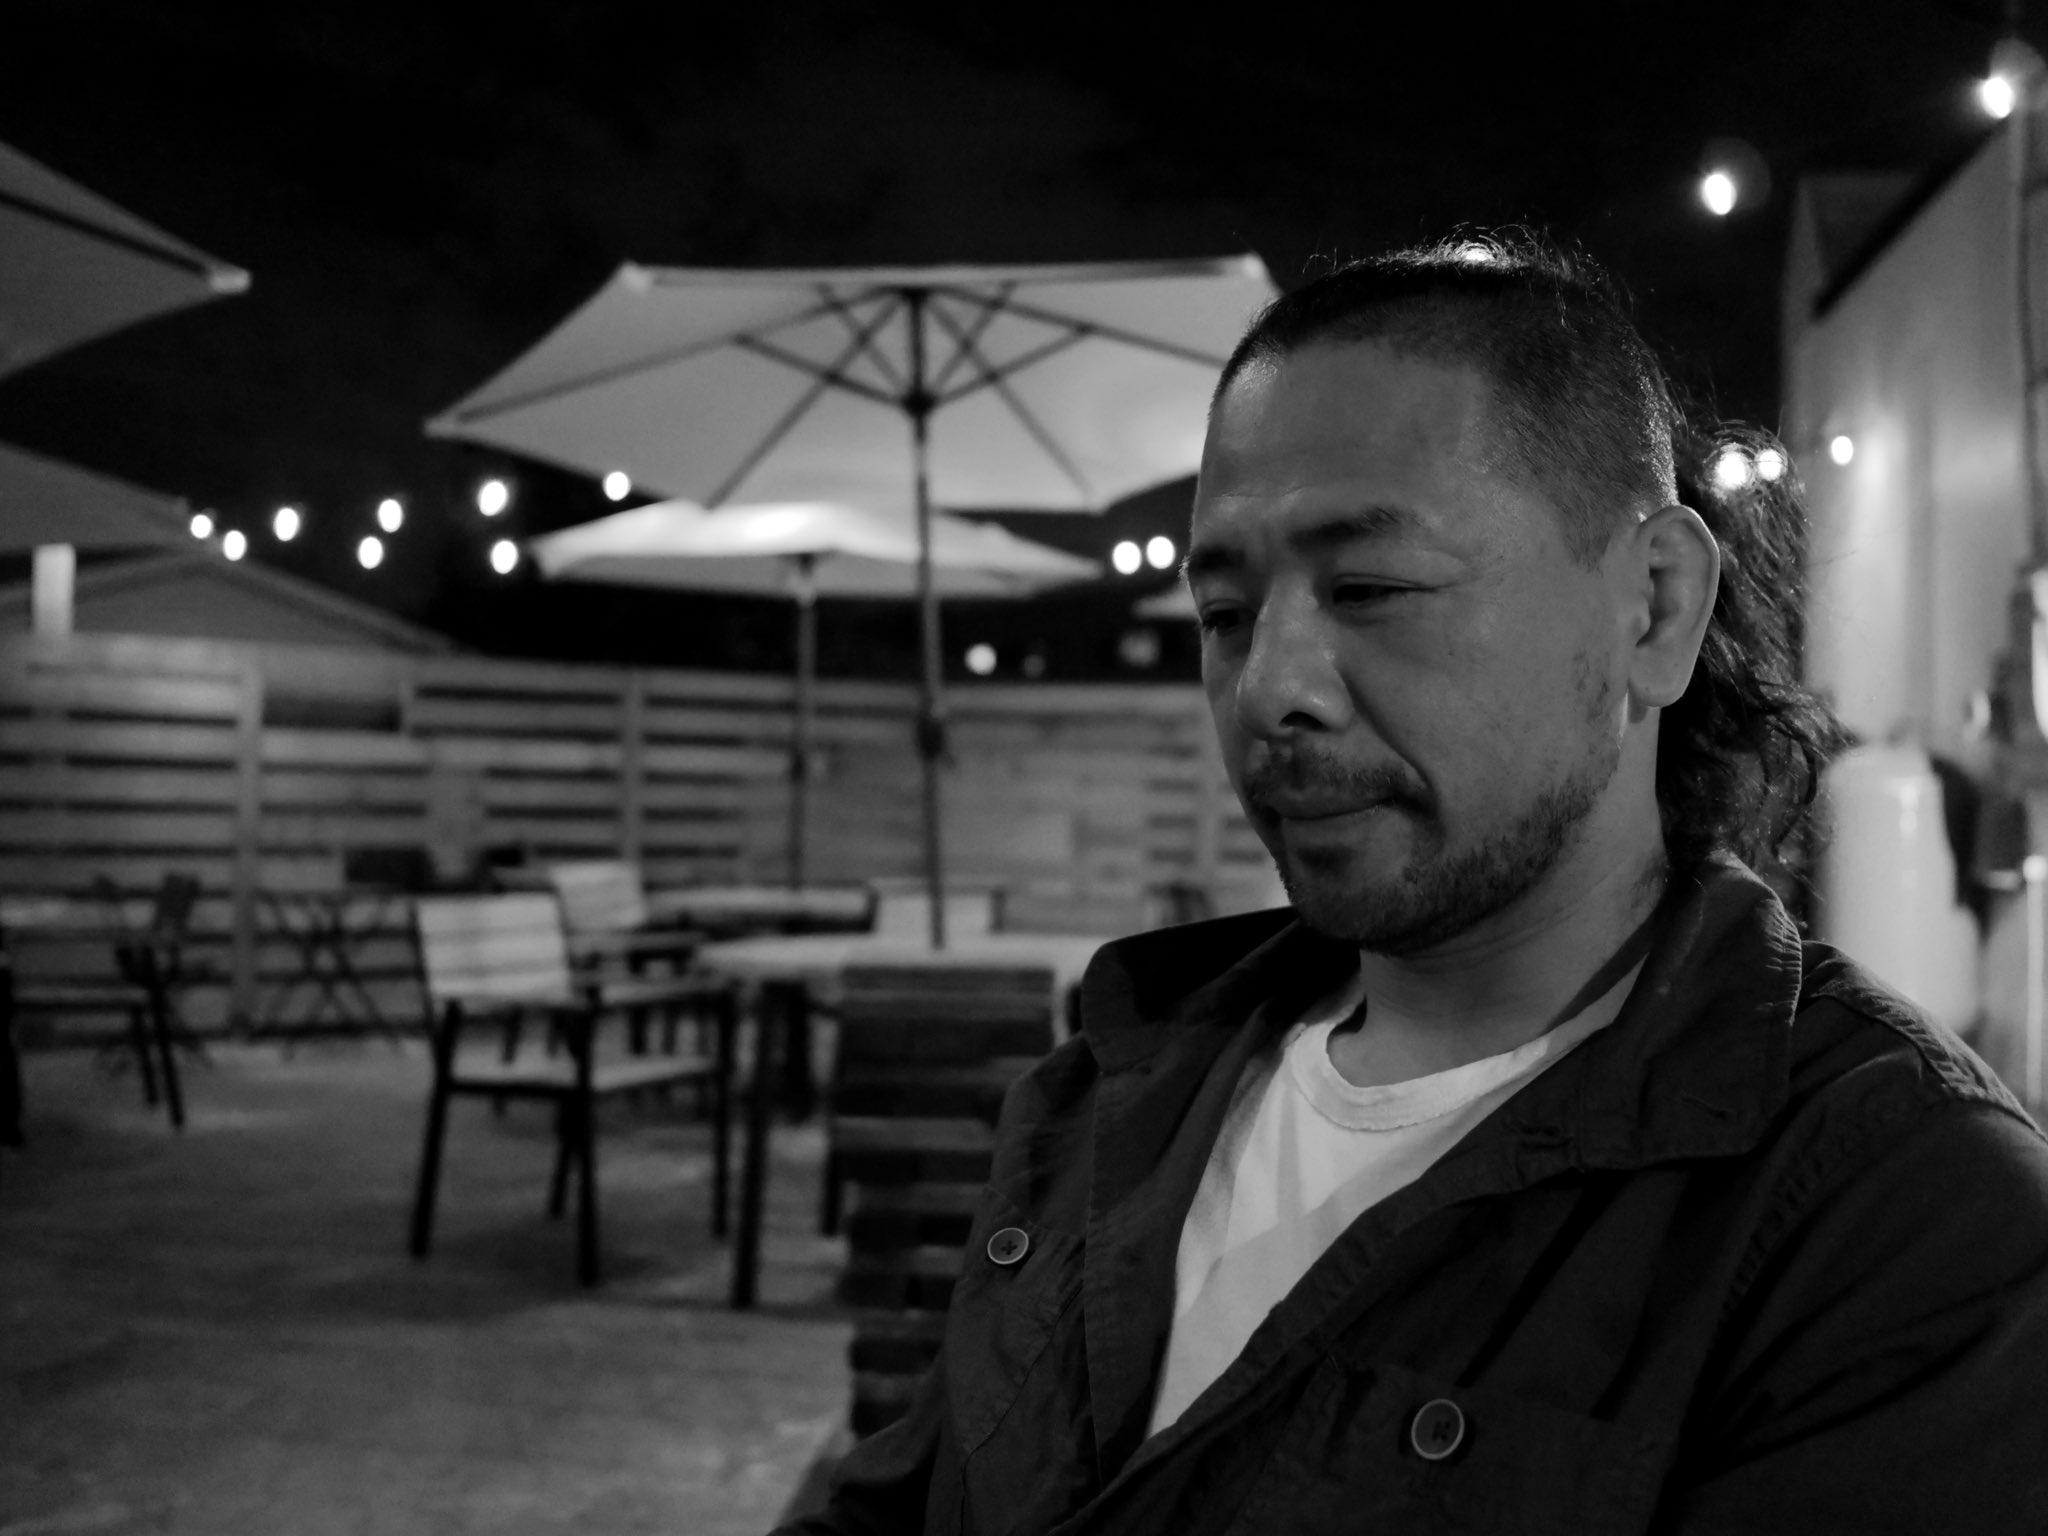 Photo: Shinsuke Nakamura Celebrates Birthday With Fellow Japanese Stars